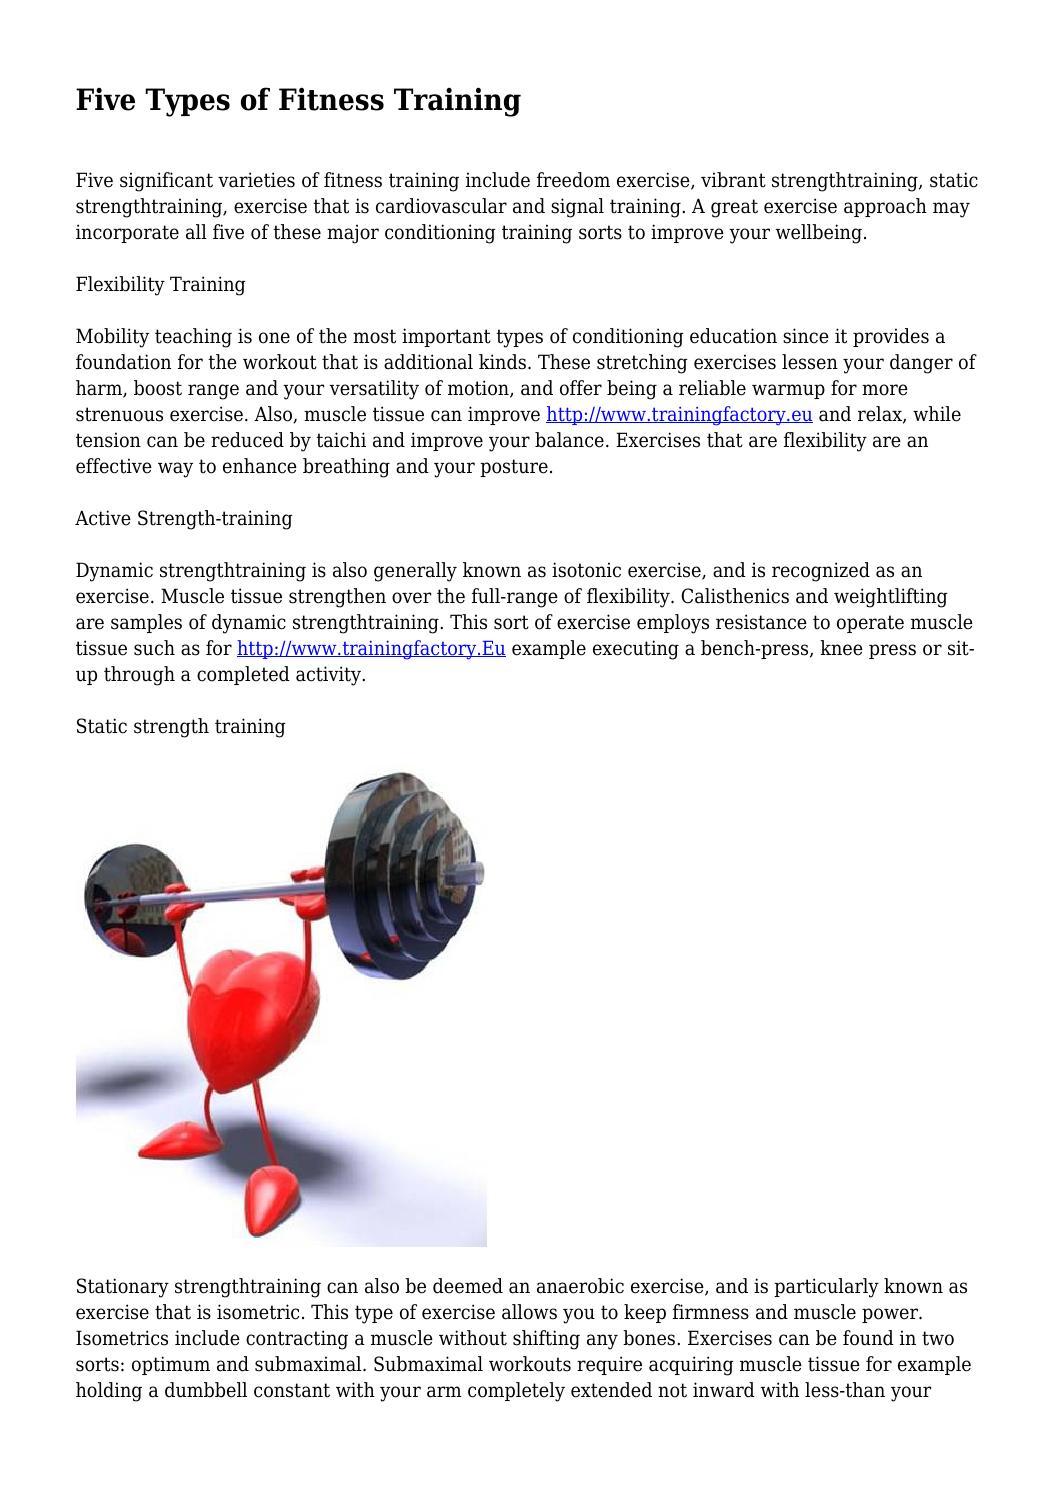 Five Types of Fitness Training by dawsonrgopijjkvl - issuu